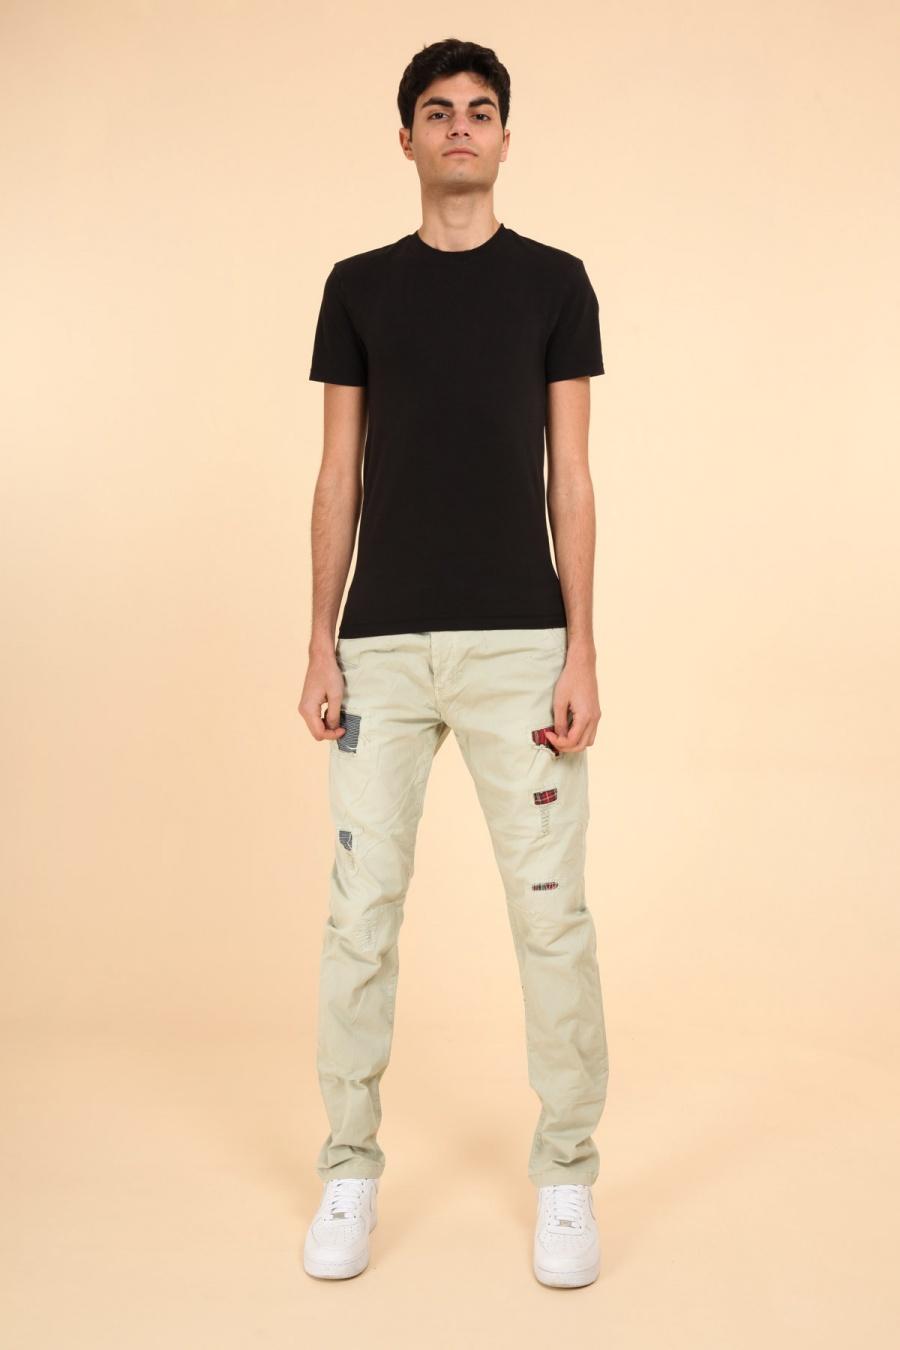 Pantalons Homme Vert ROY LYS RK929 #c eFashion Paris